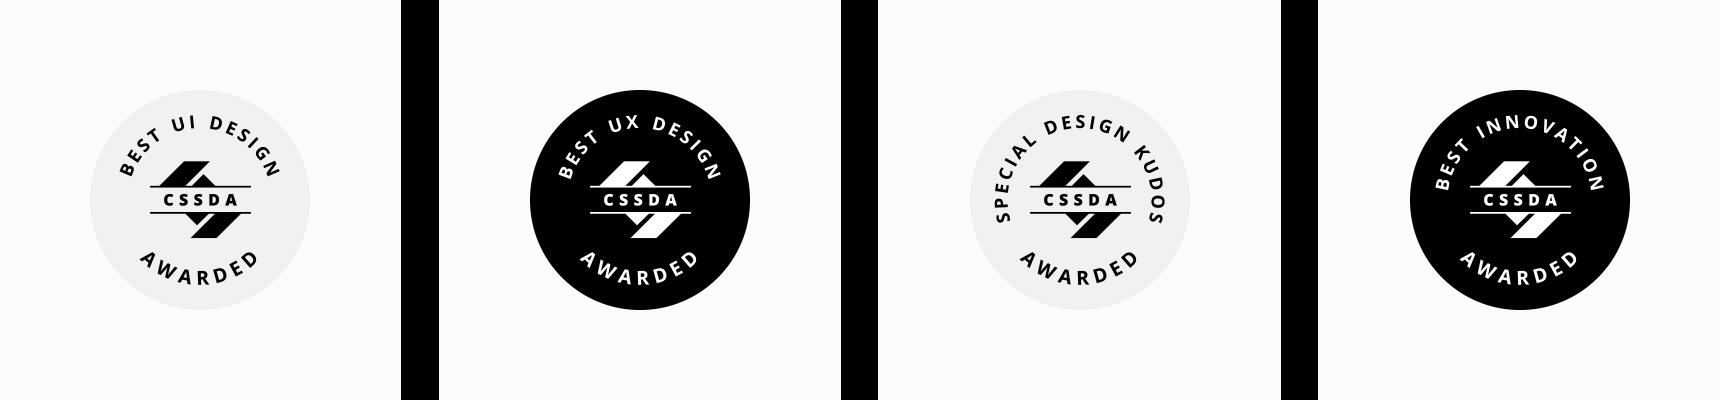 CSS Design Awards - 8chDesign - B+L